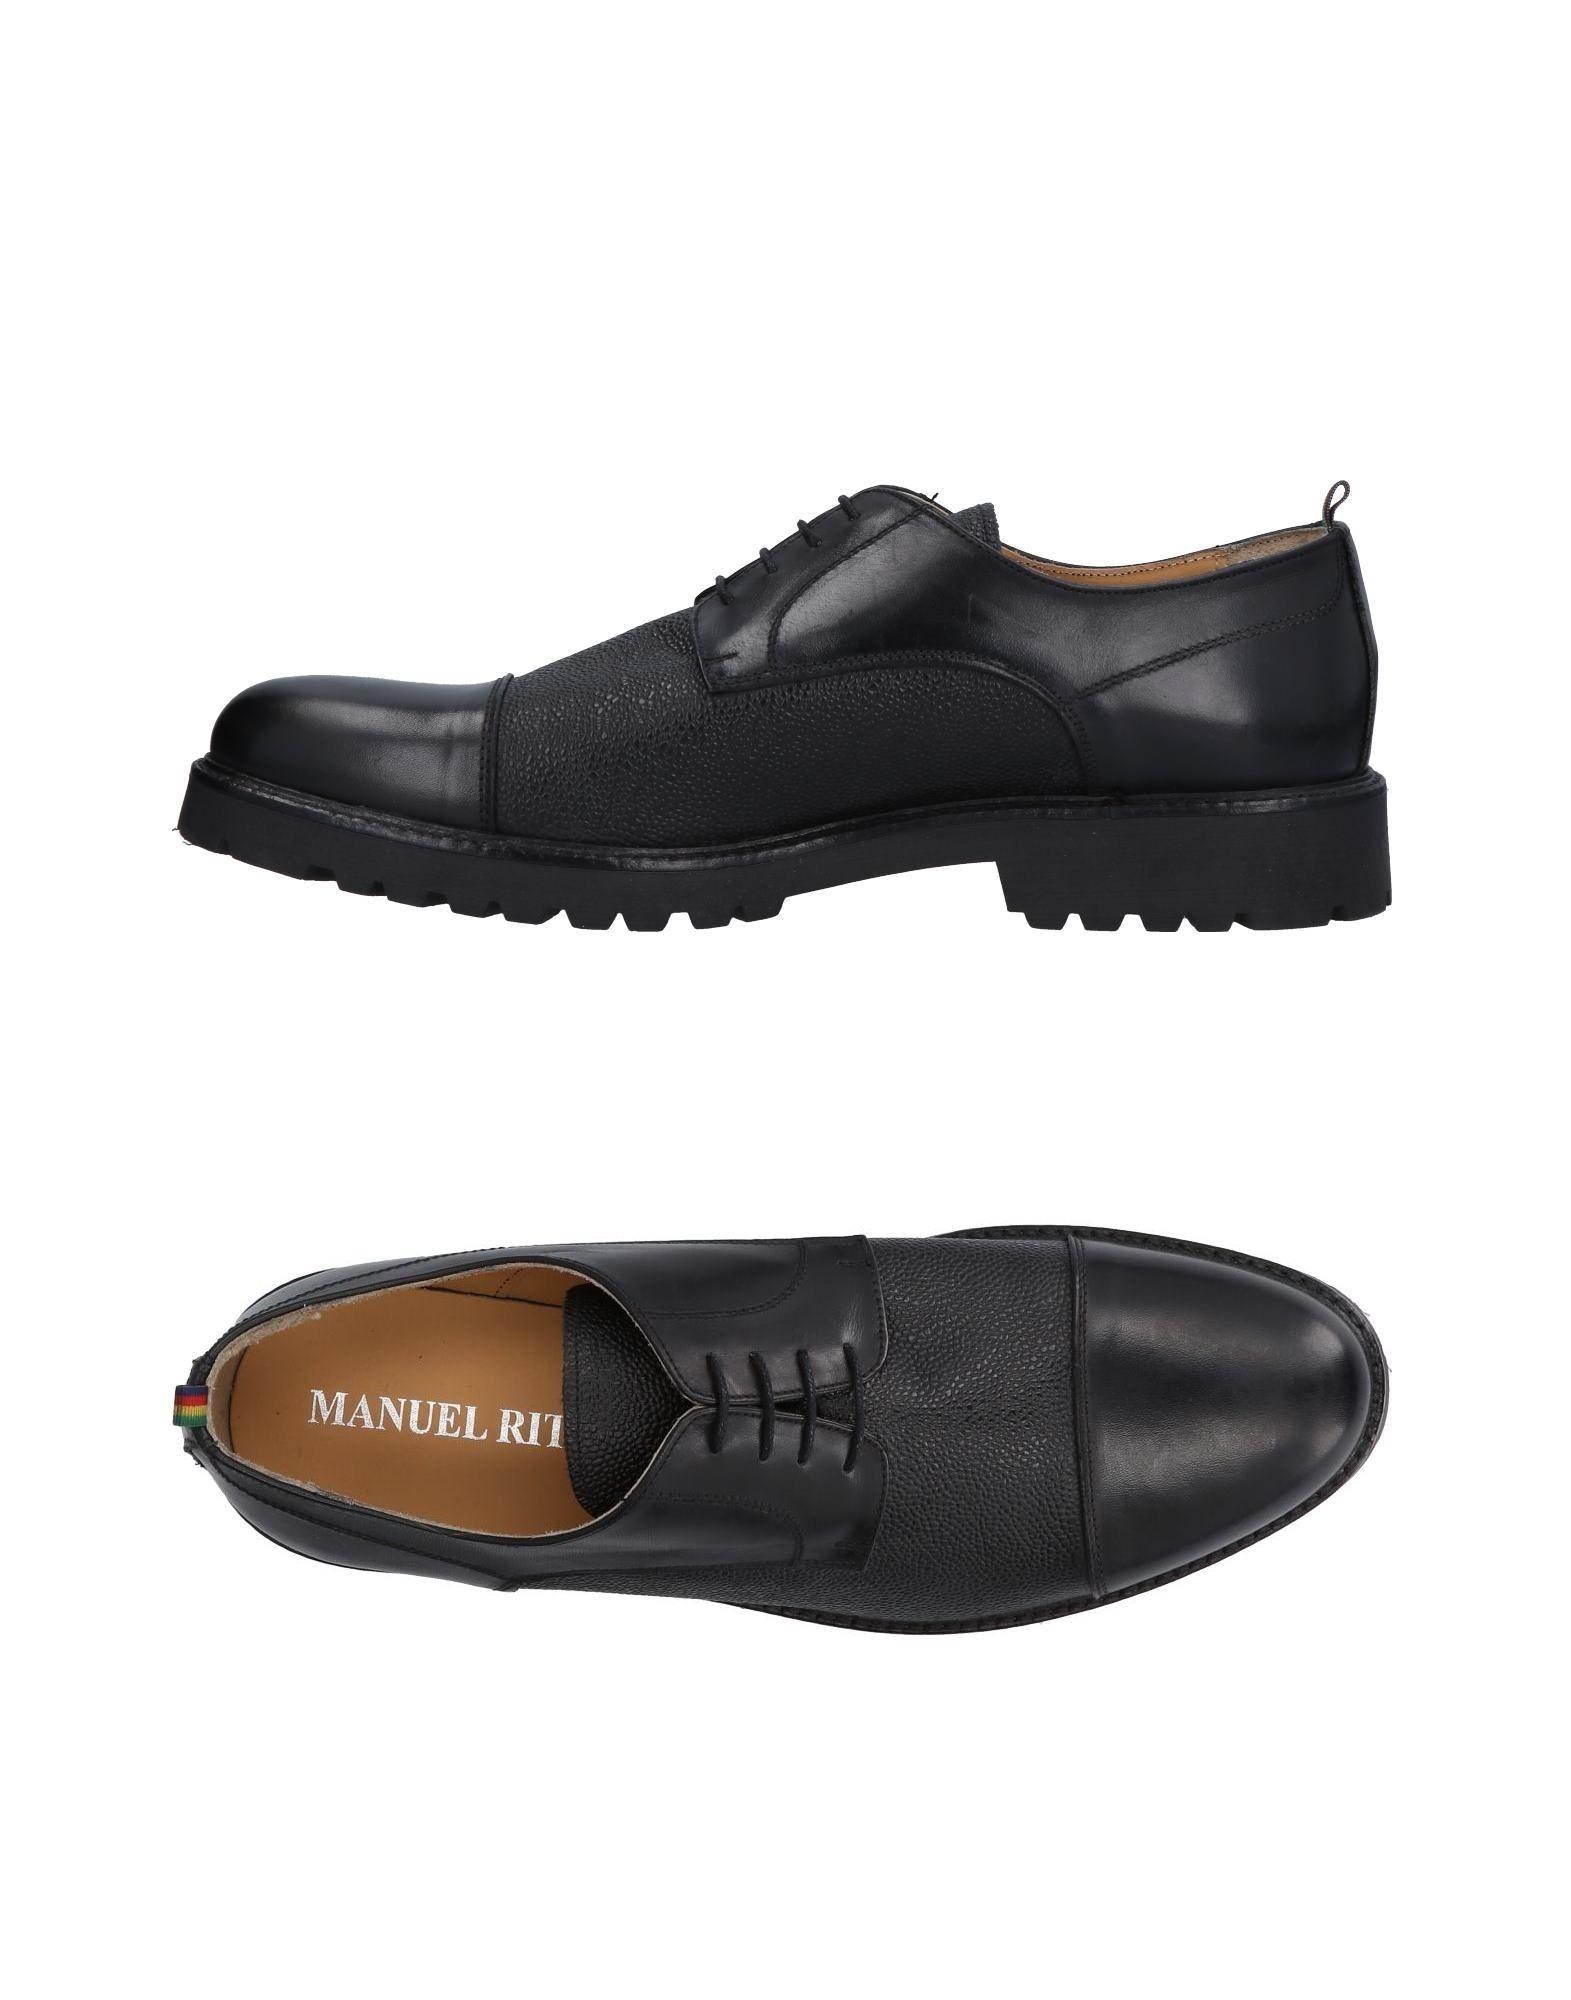 Manuel Schuhe Ritz Schnürschuhe Herren  11486255KM Neue Schuhe Manuel 87fcdd